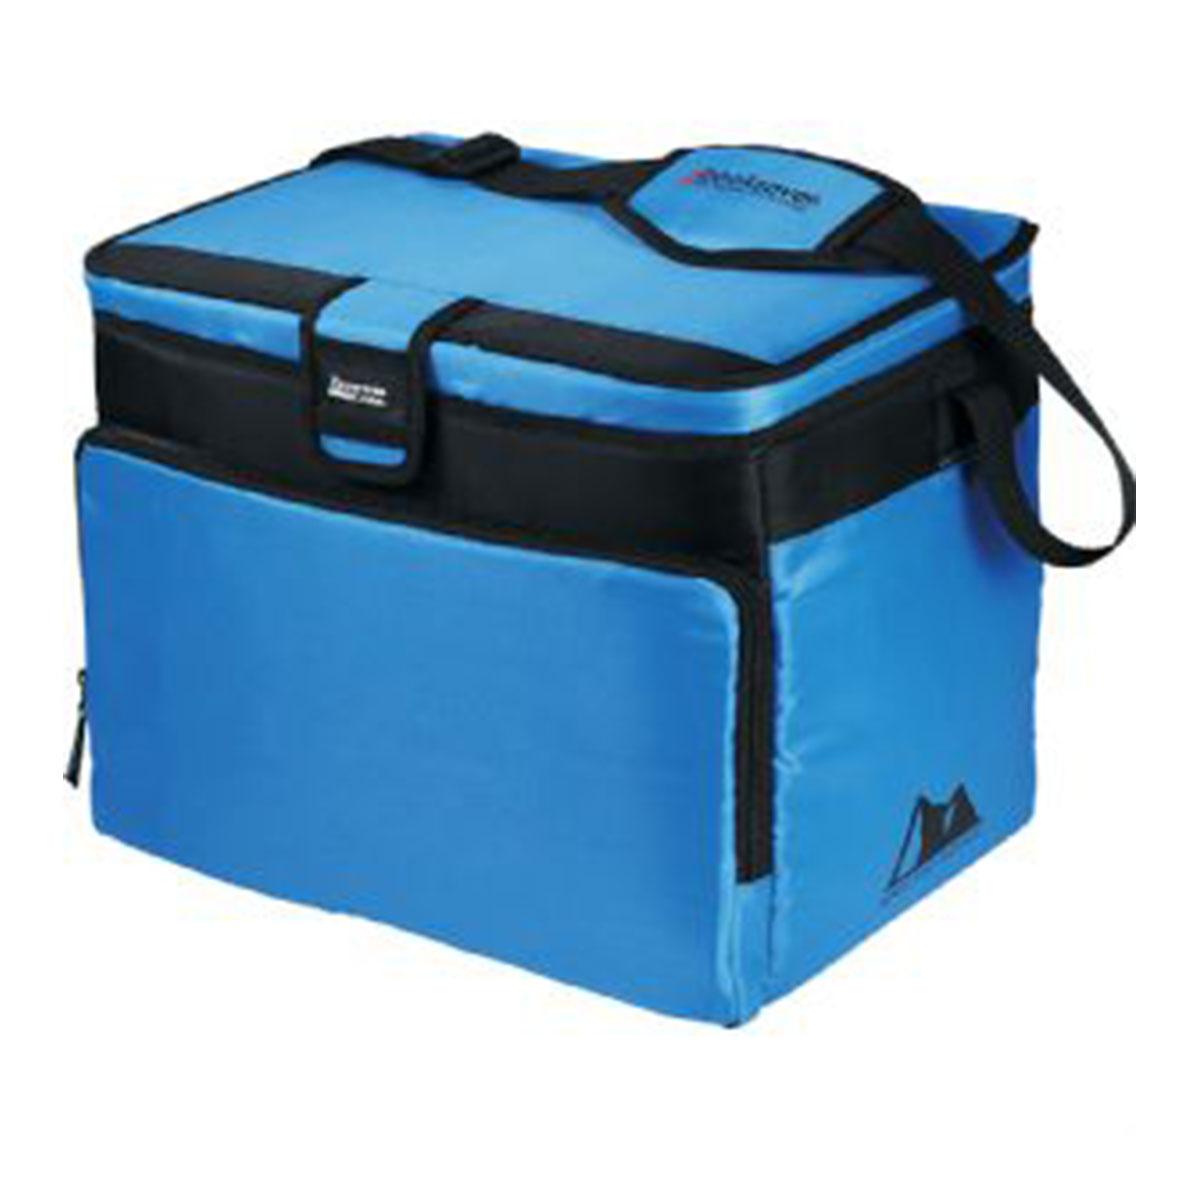 Arctic Zone®  30-Can Zipperless HardBody Cooler-Blue with Black Trim.